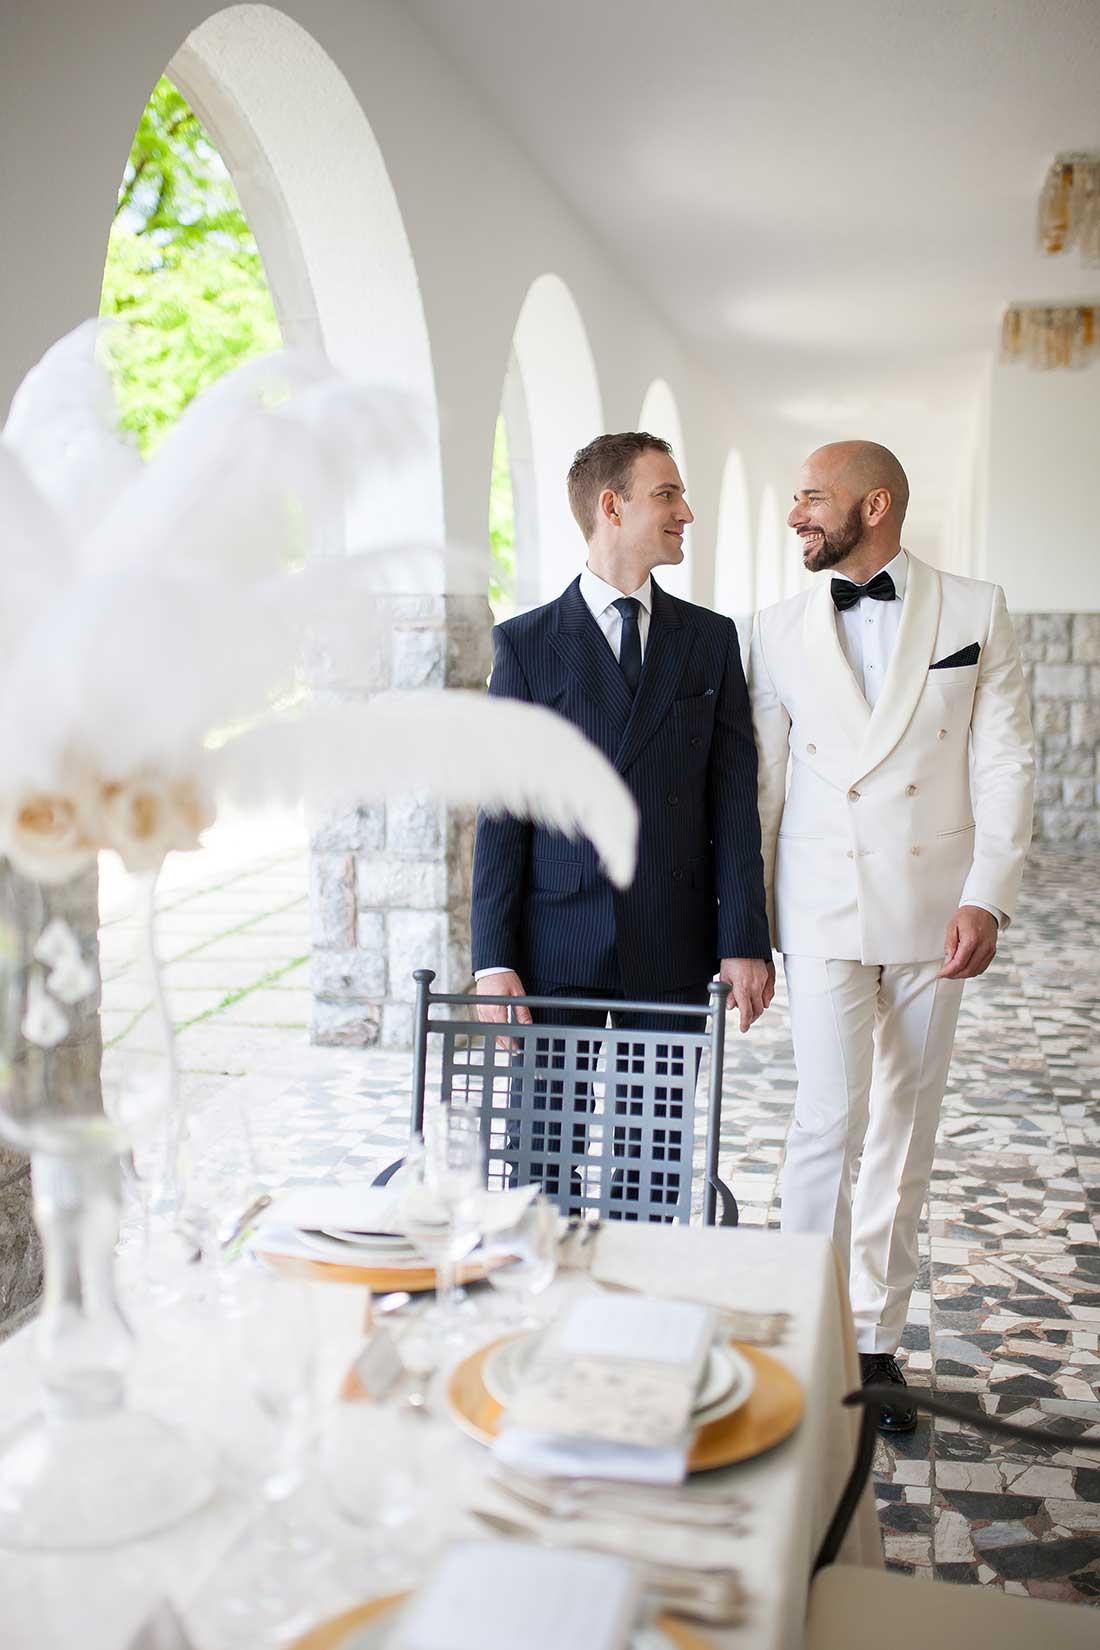 IL-34-wedding-main-table-samesex-wedding